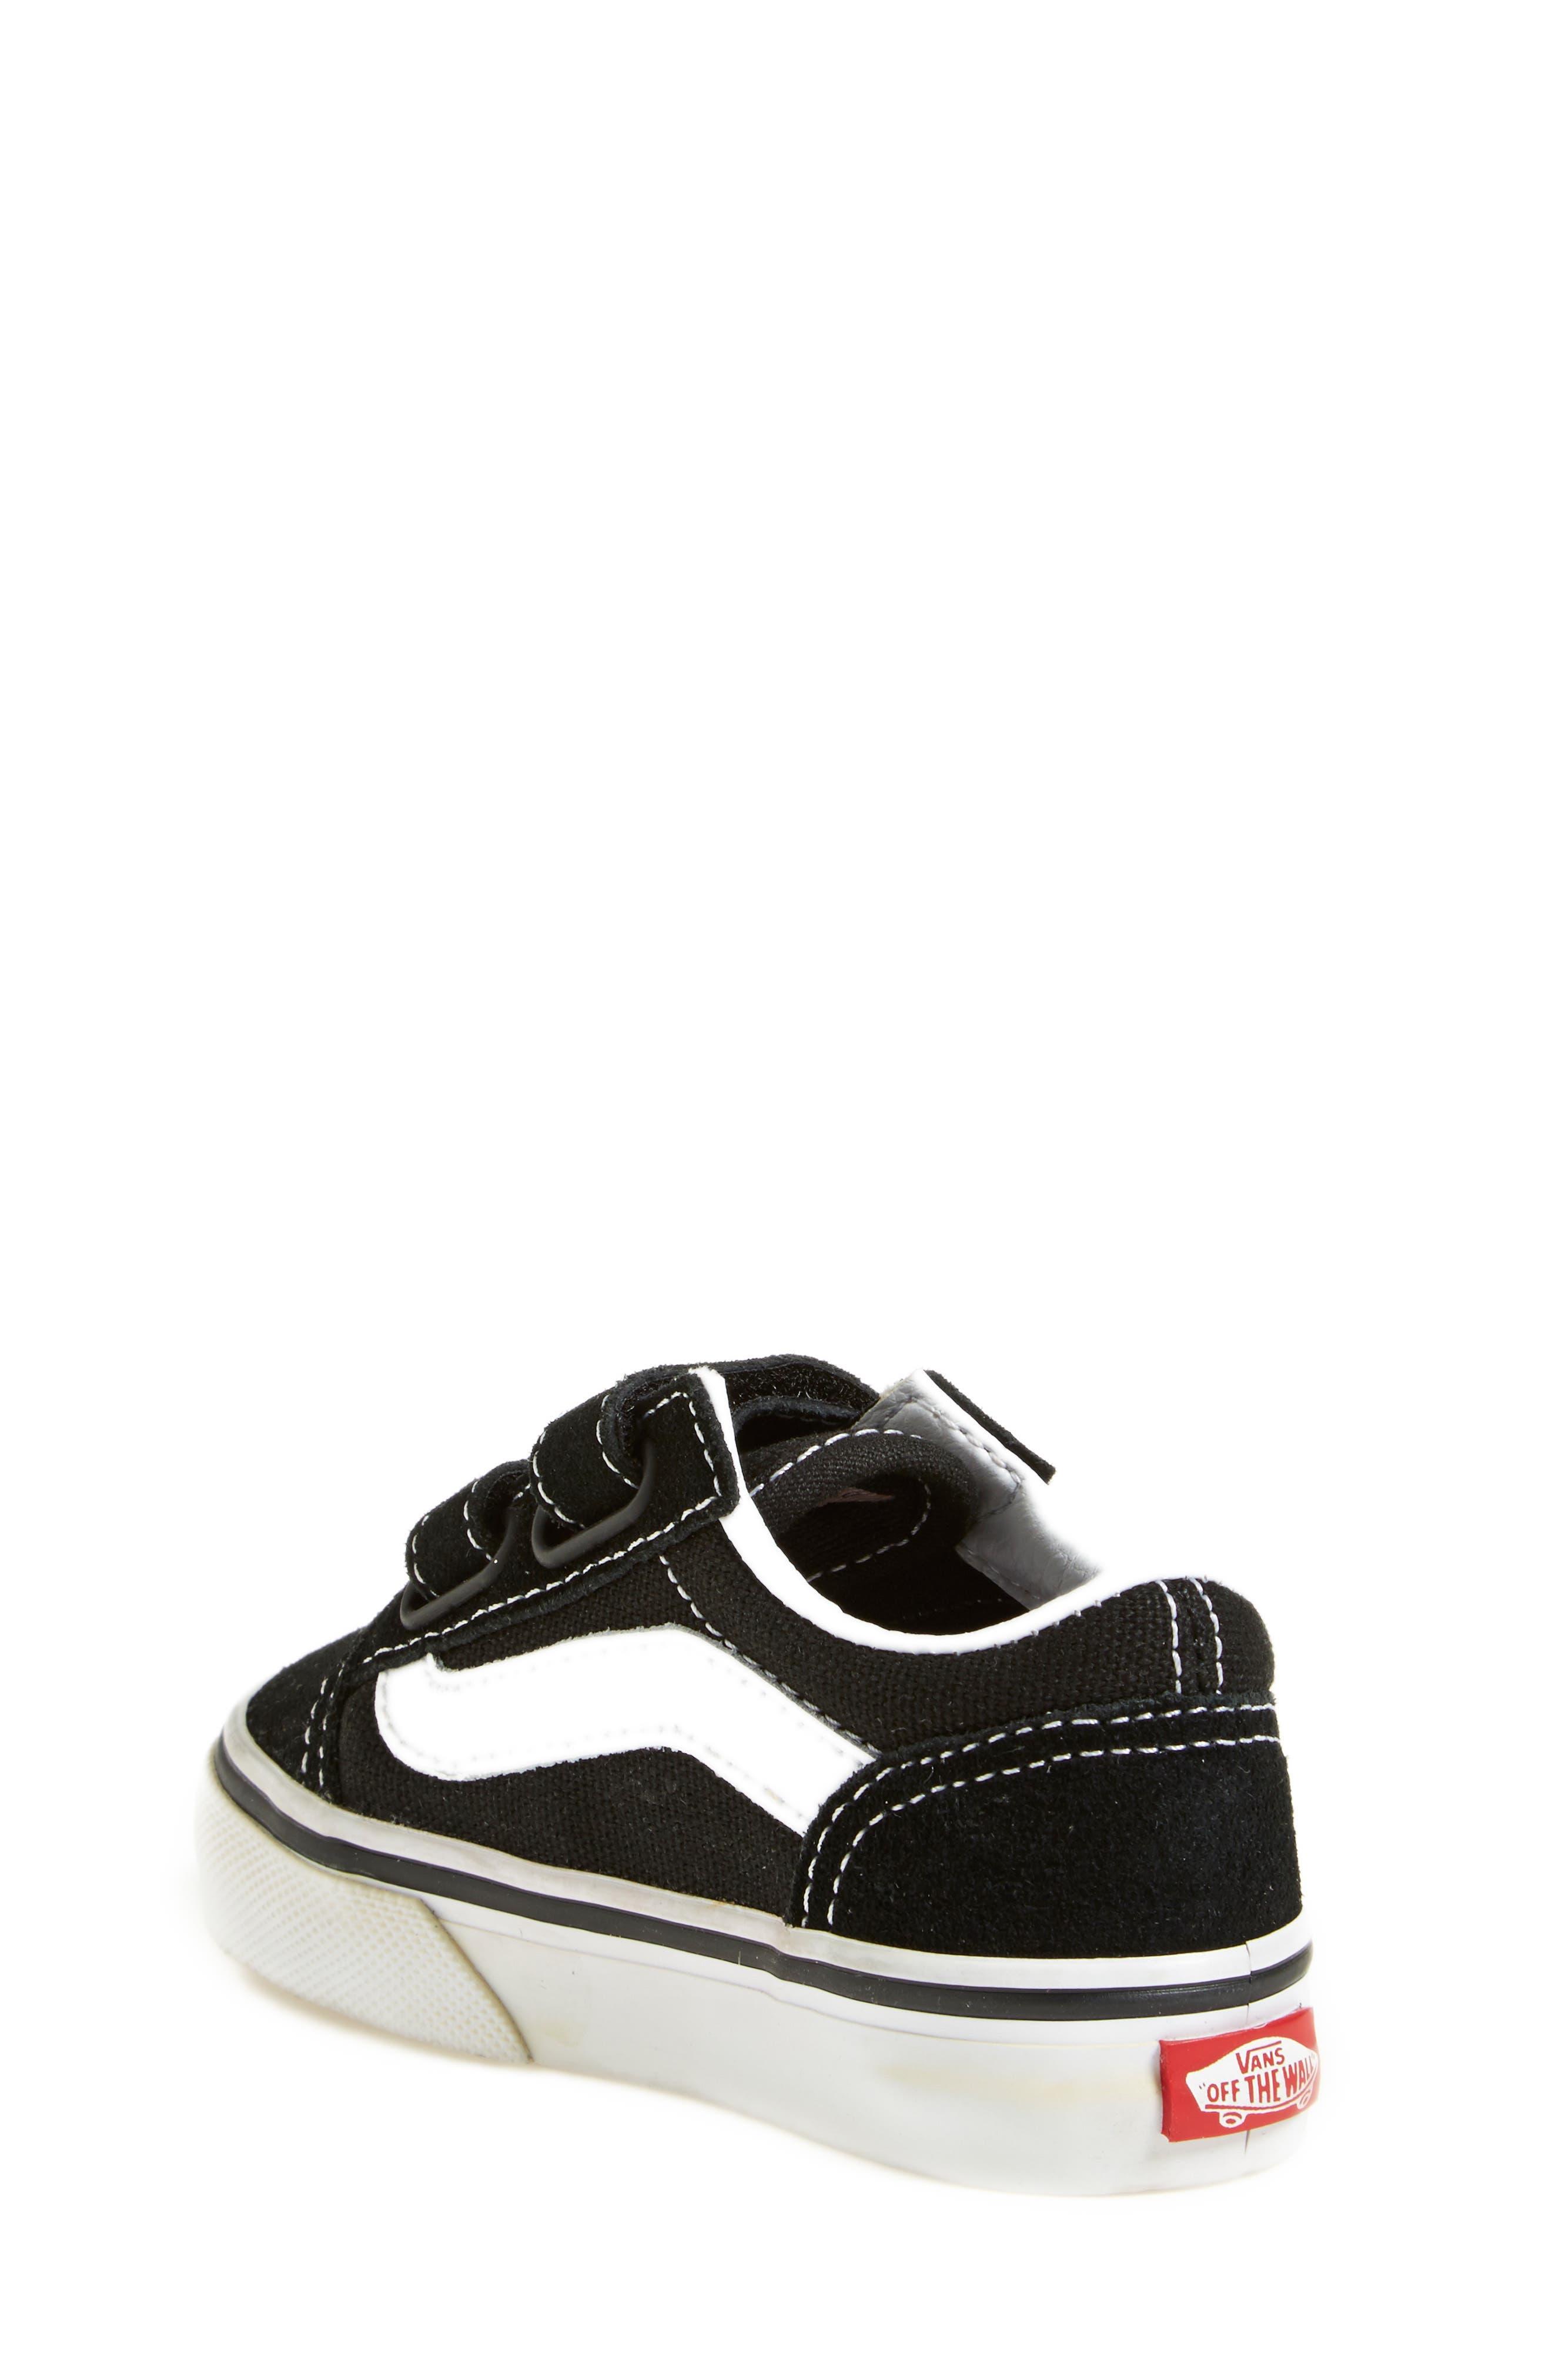 'Old Skool' Sneaker,                             Alternate thumbnail 2, color,                             Black